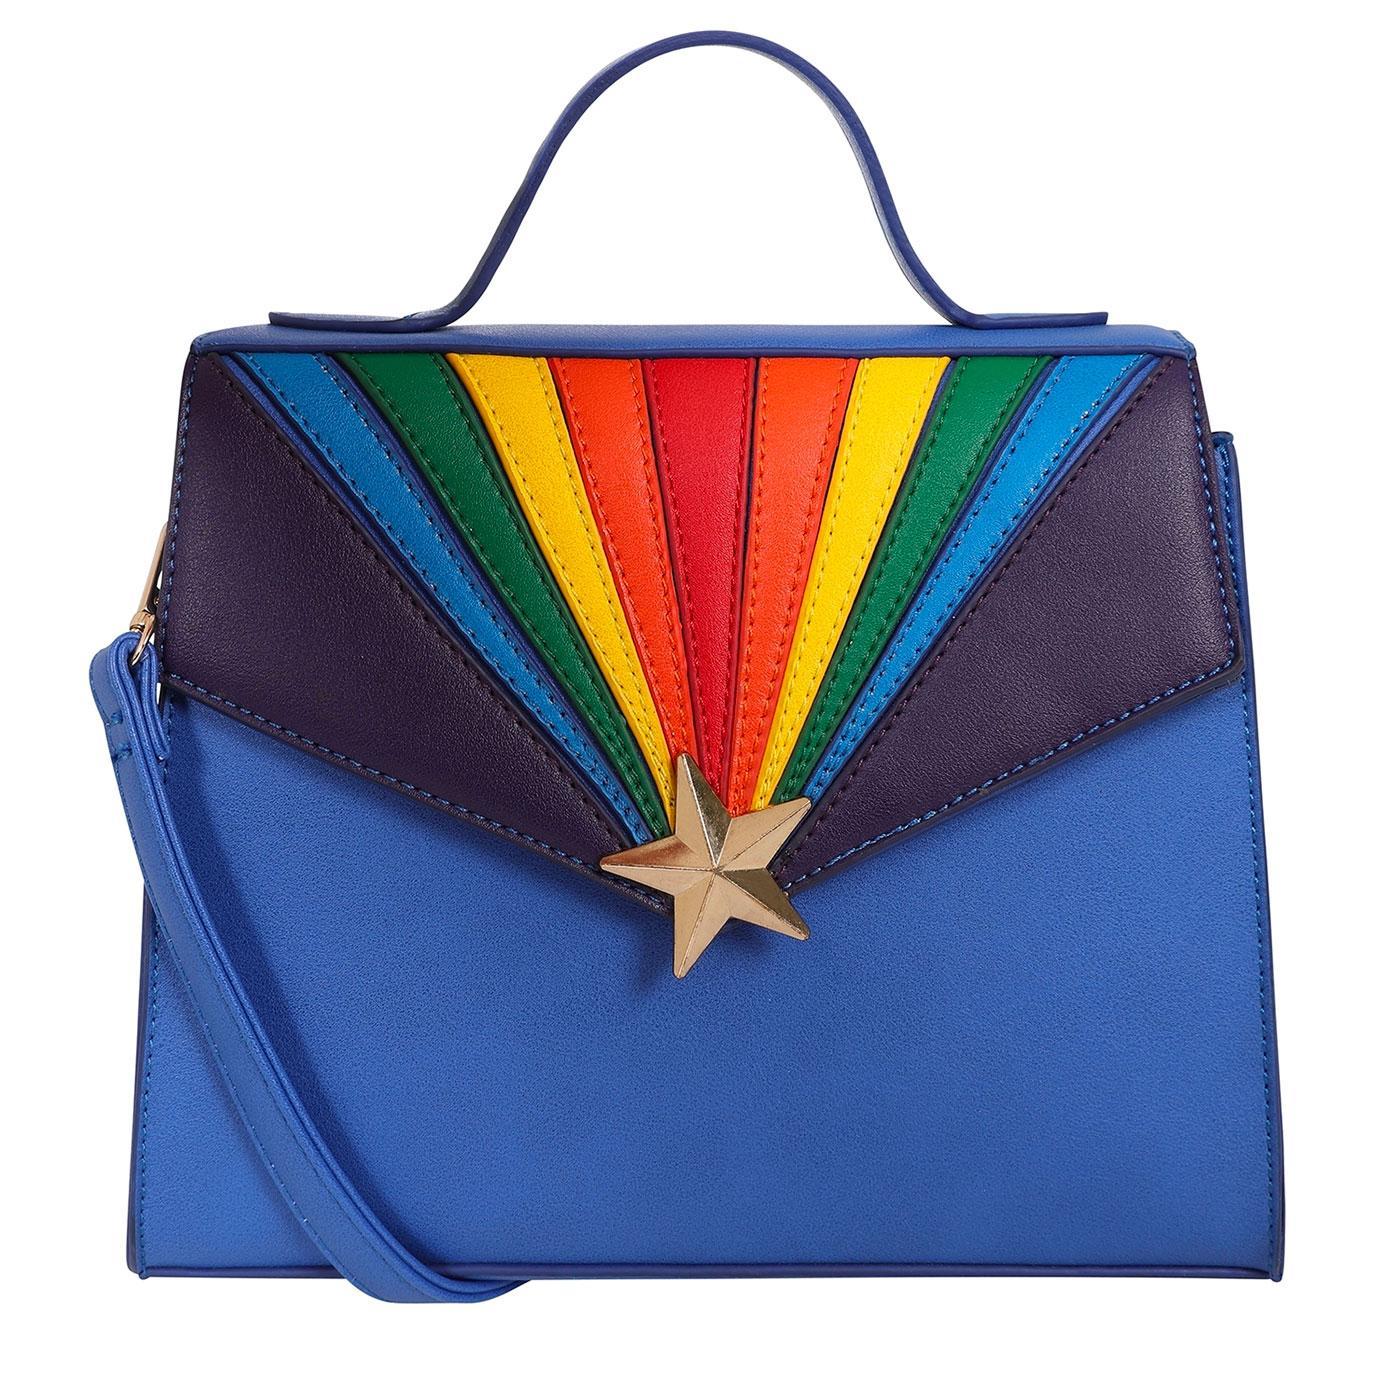 Lara LULU HUN Retro 70s Rainbow Handbag in Blue